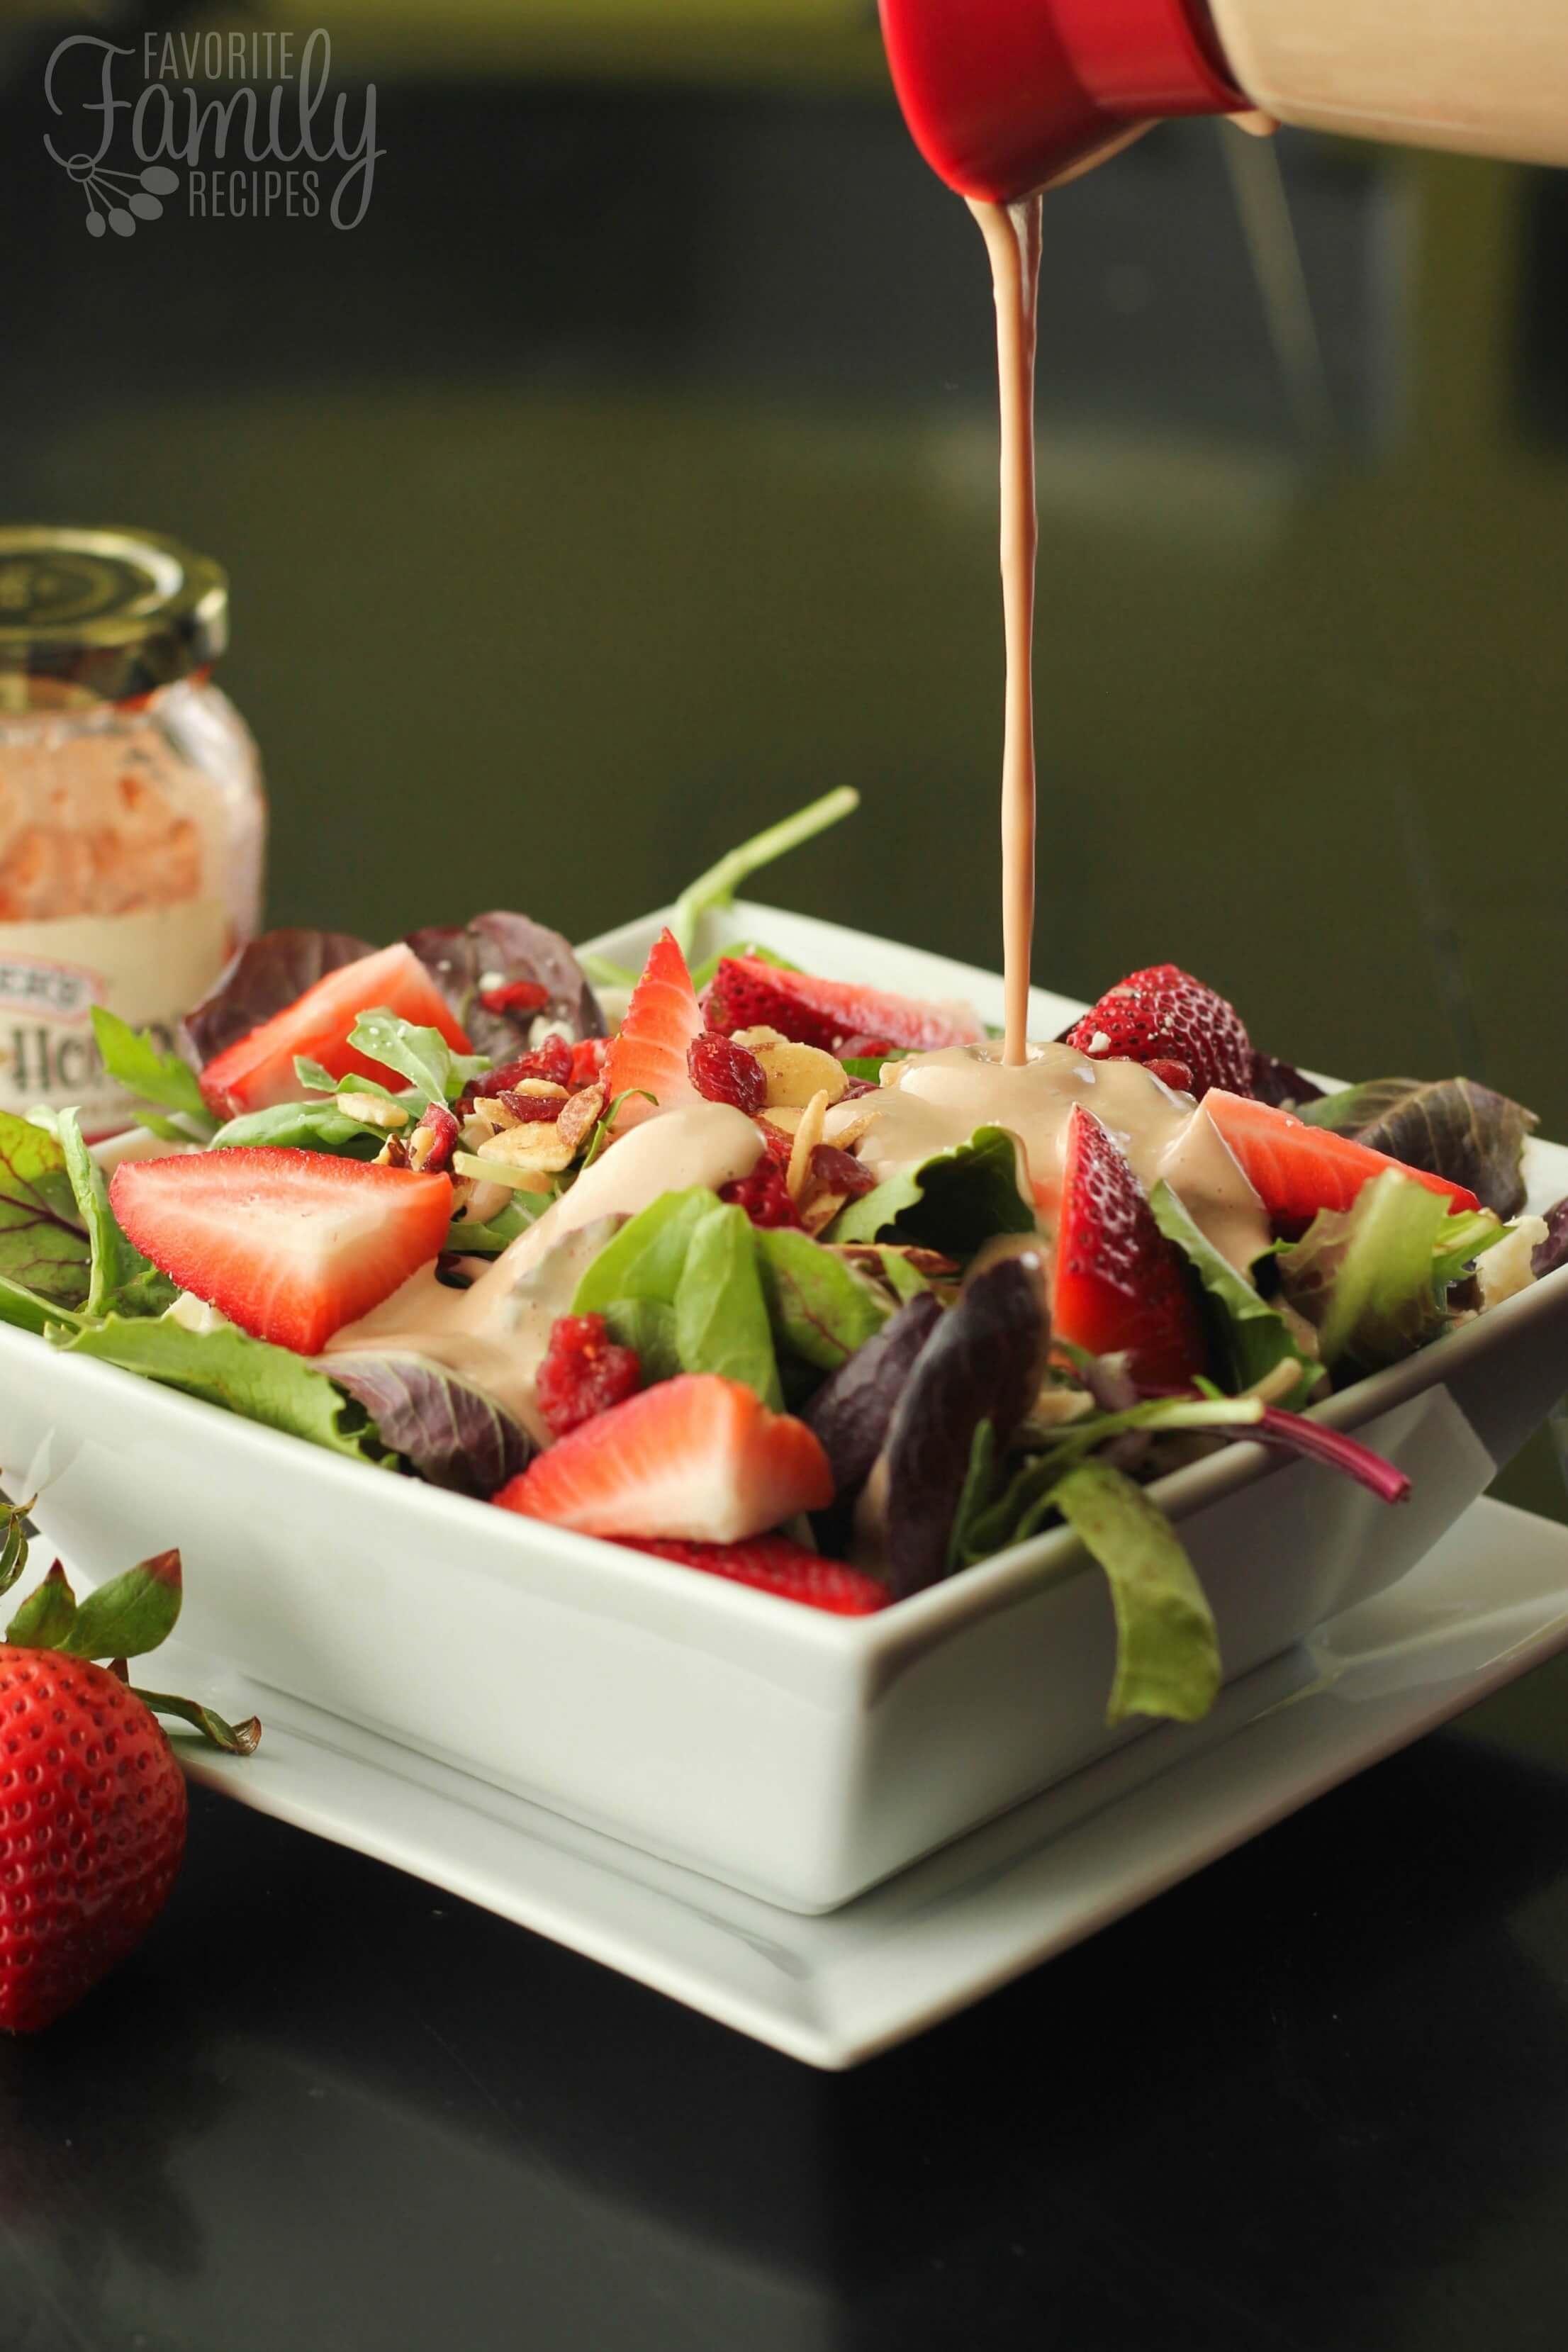 Creamy Strawberry Balsamic Dressing Favorite Family Recipes